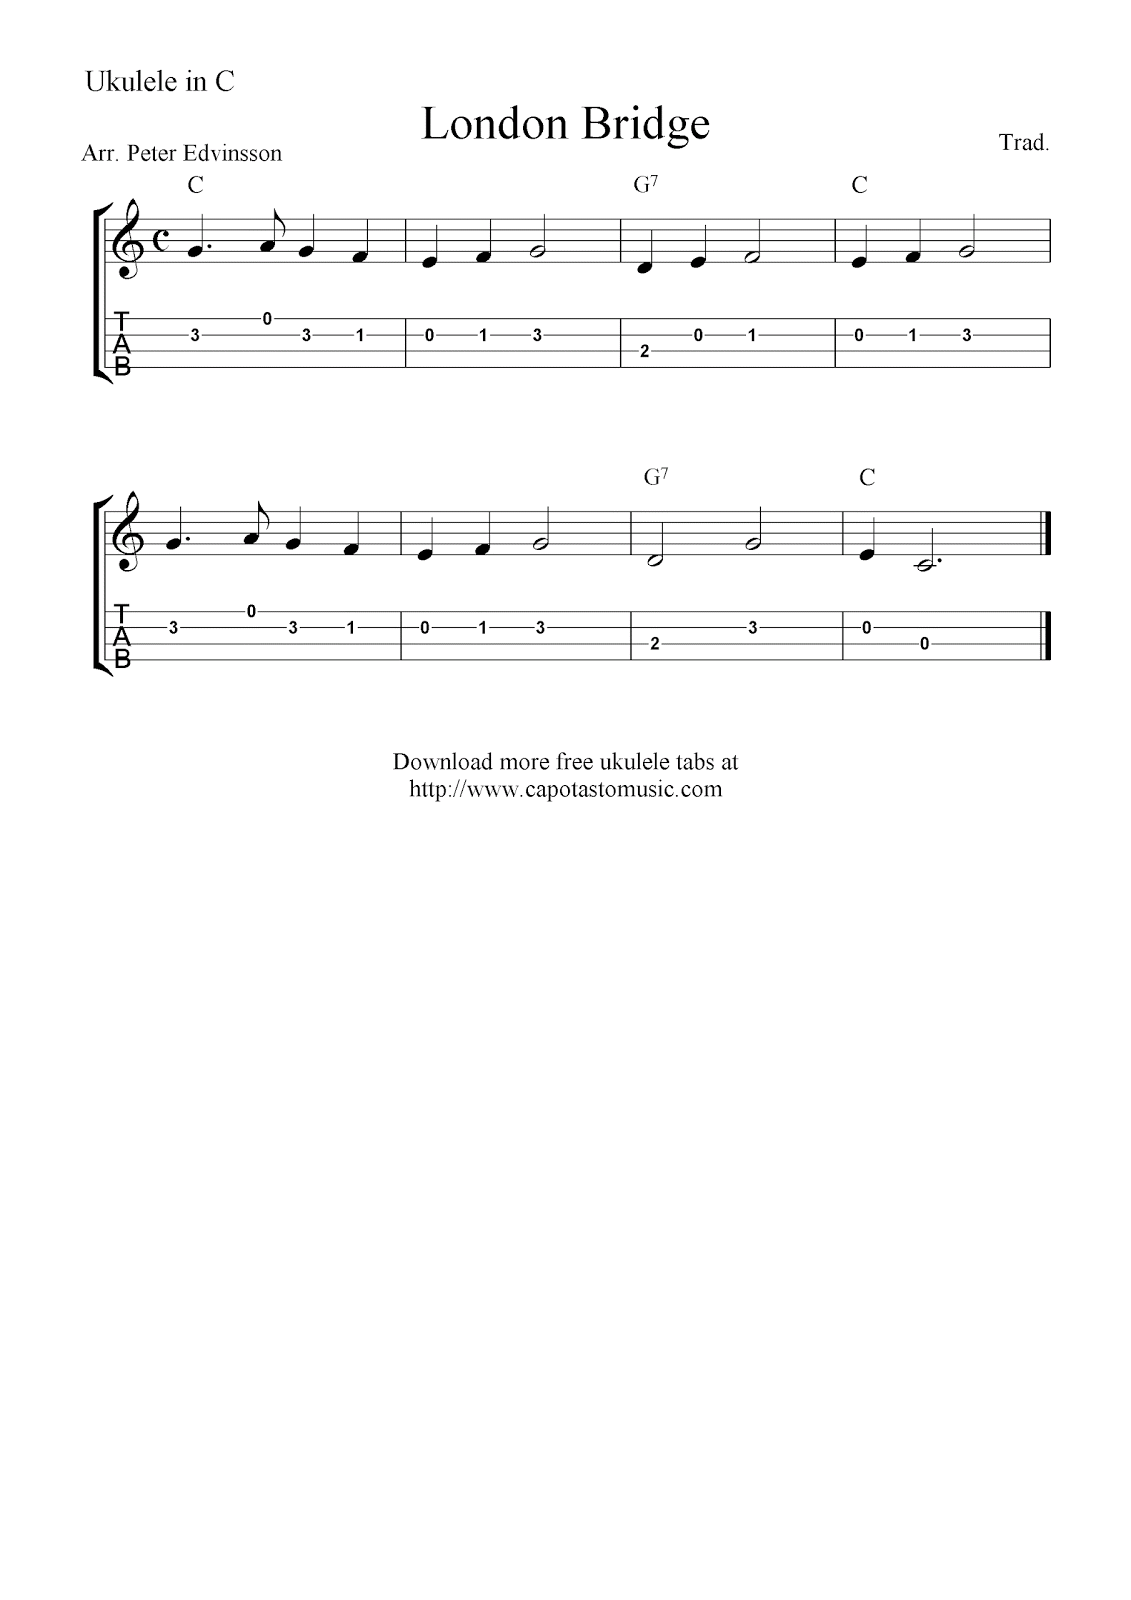 Bilderesultat for ukulele tabs ukulele pinterest ukulele ukulele tabs ukulele songs ukulele chords ukulele tuning music wall london bridge music lessons sheet music bridges beautiful dreamer hexwebz Gallery